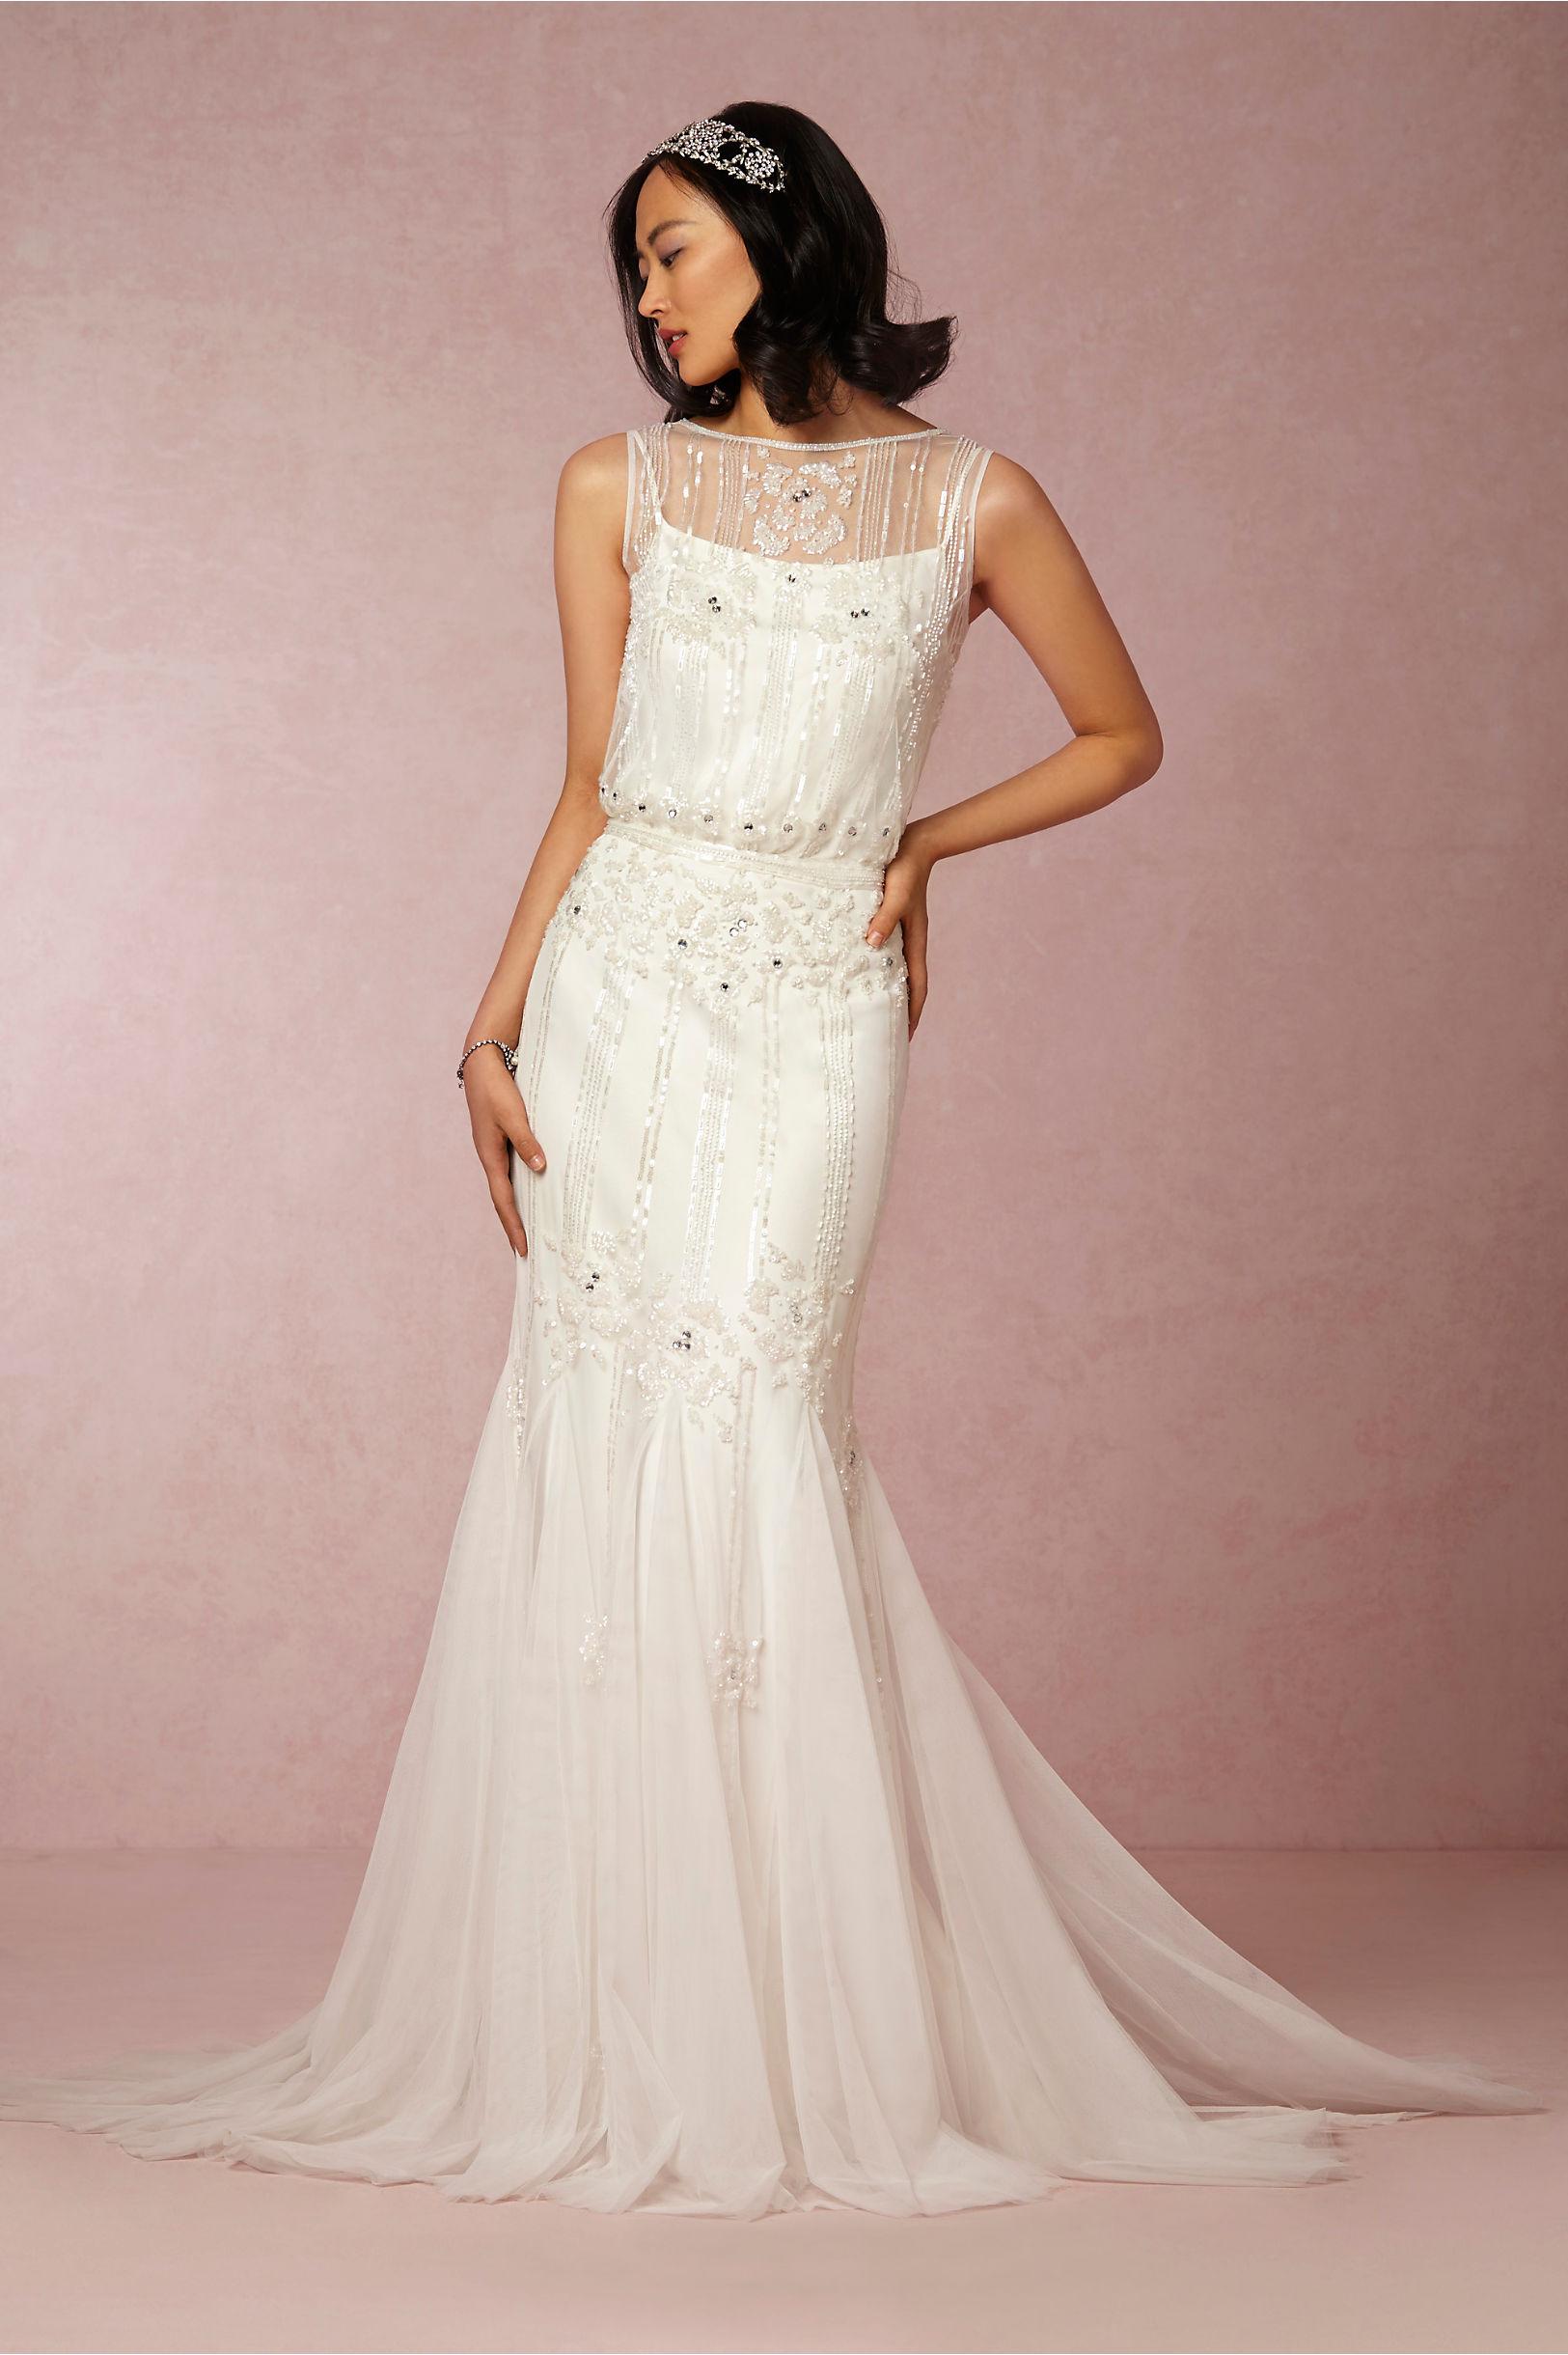 Magnolia Gown in Bride   BHLDN